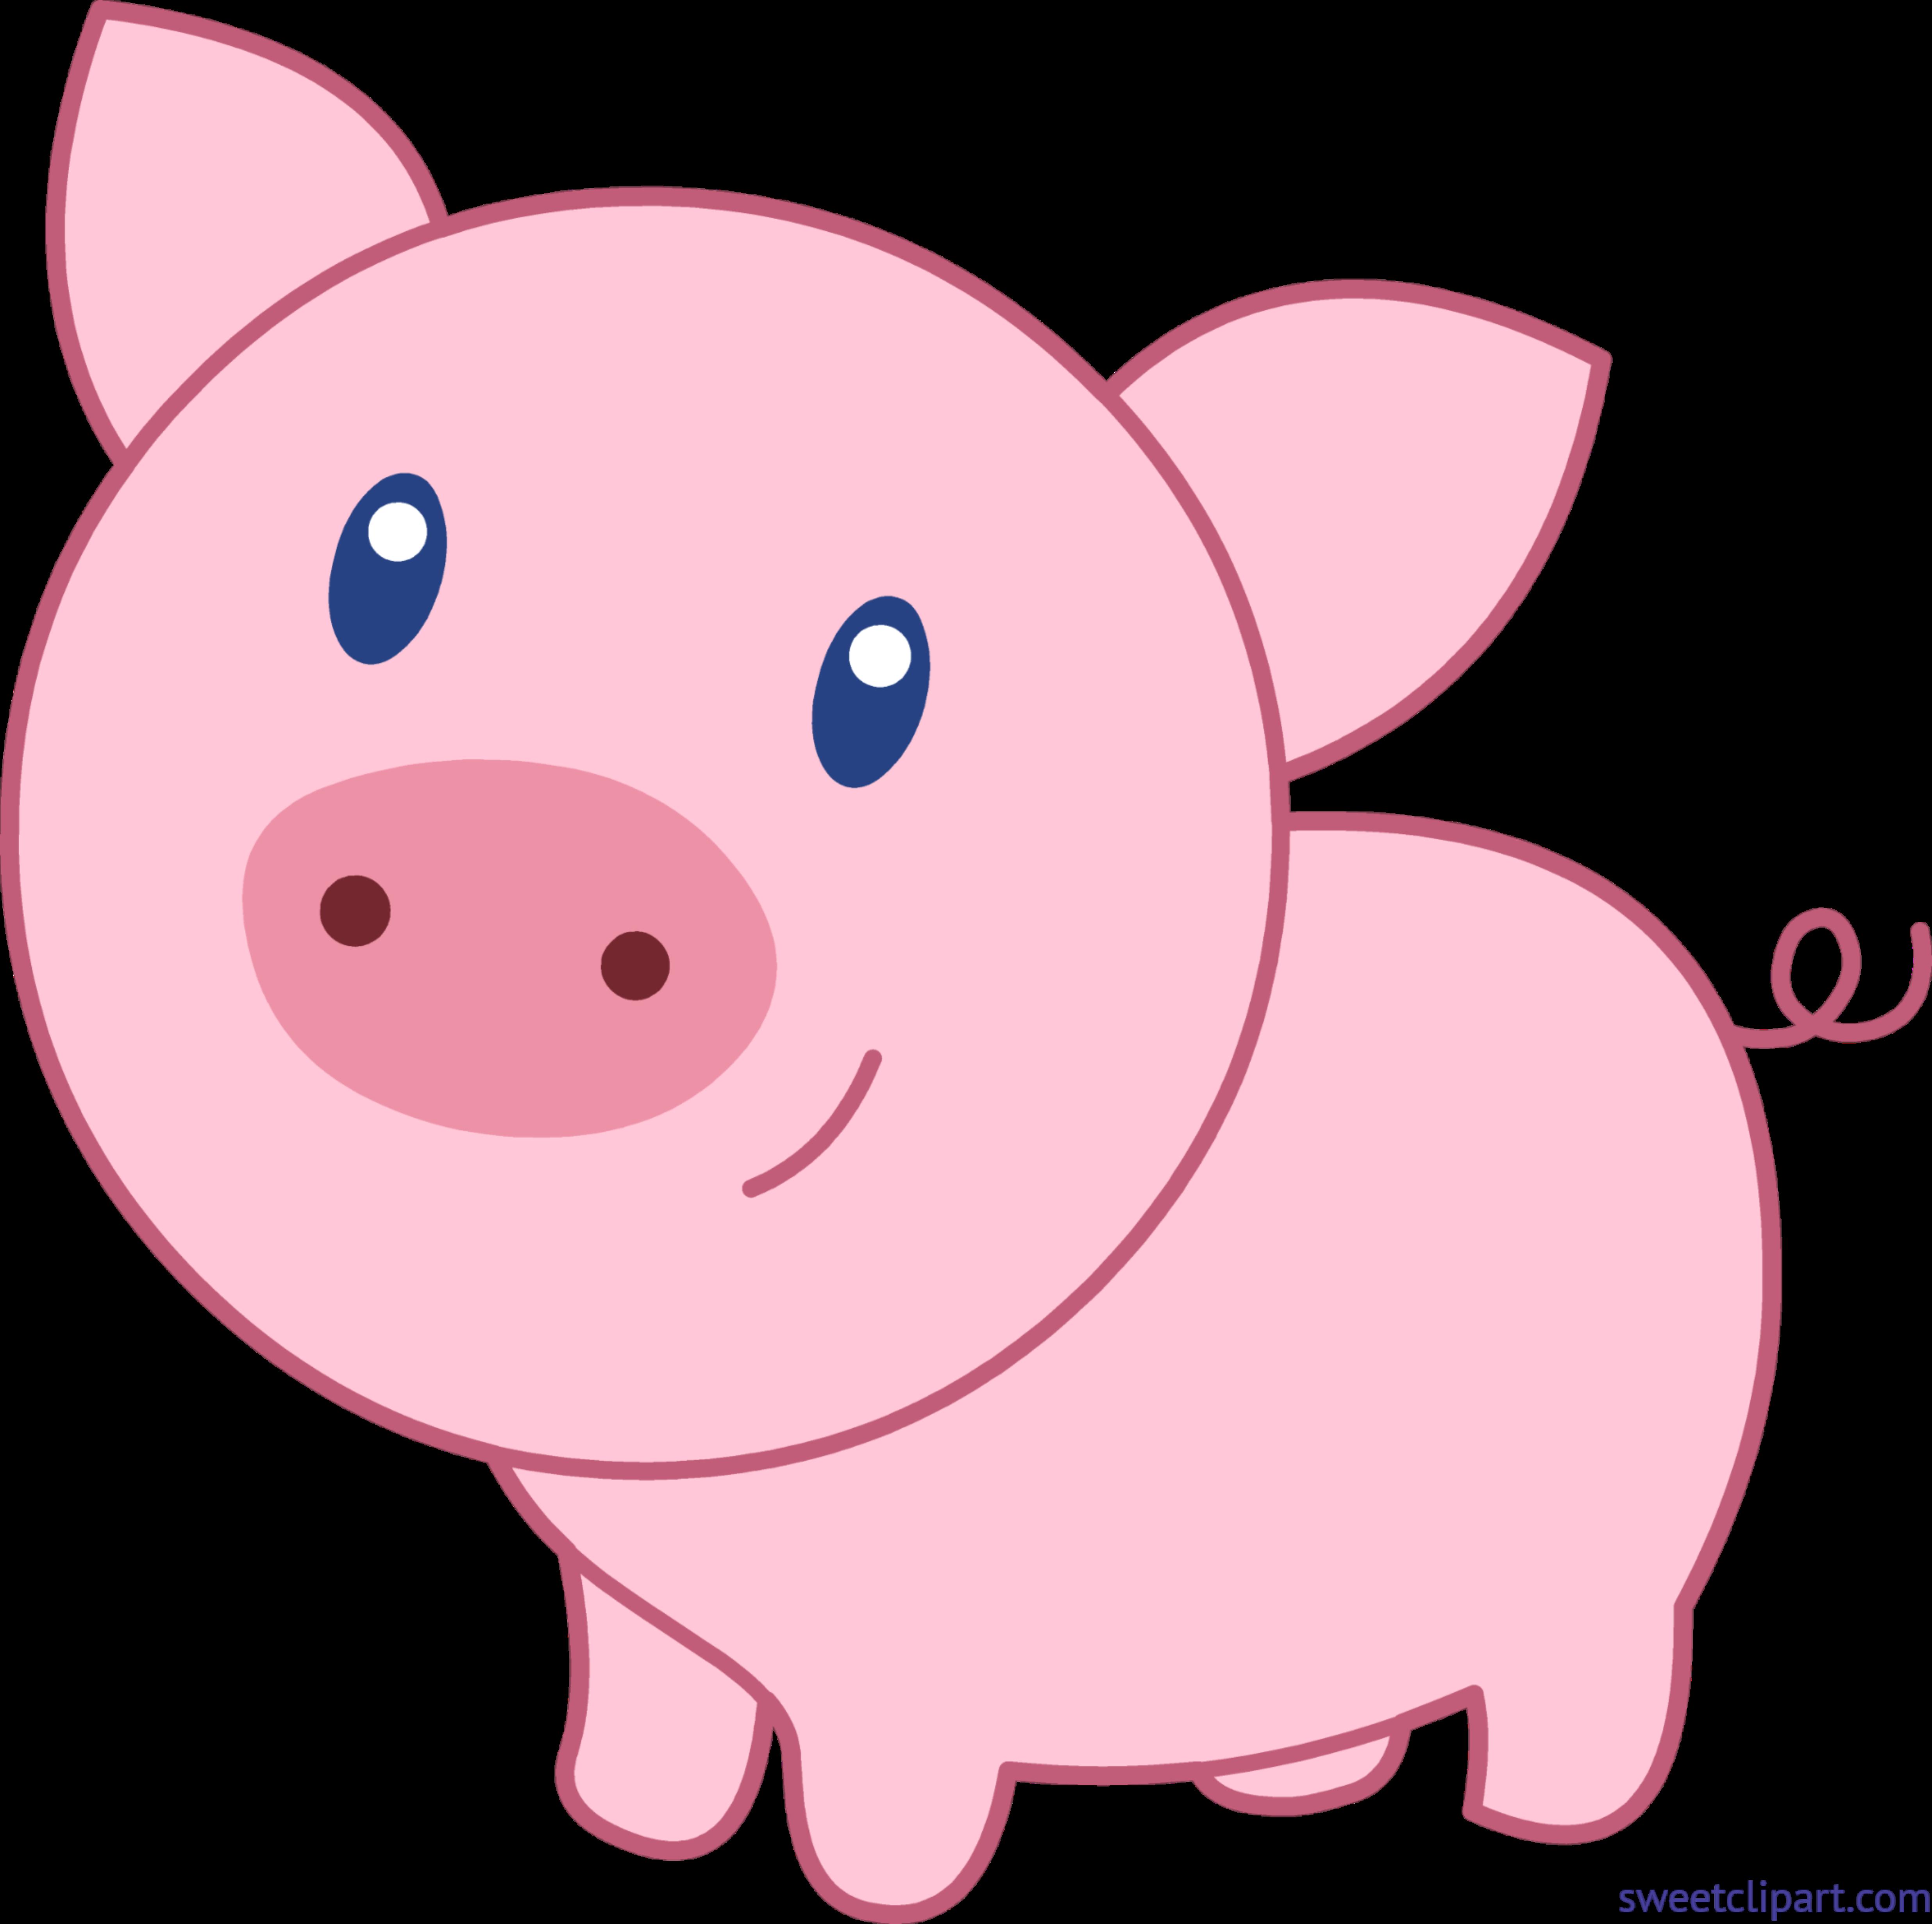 Cute clip art sweet. Clipart pig outline